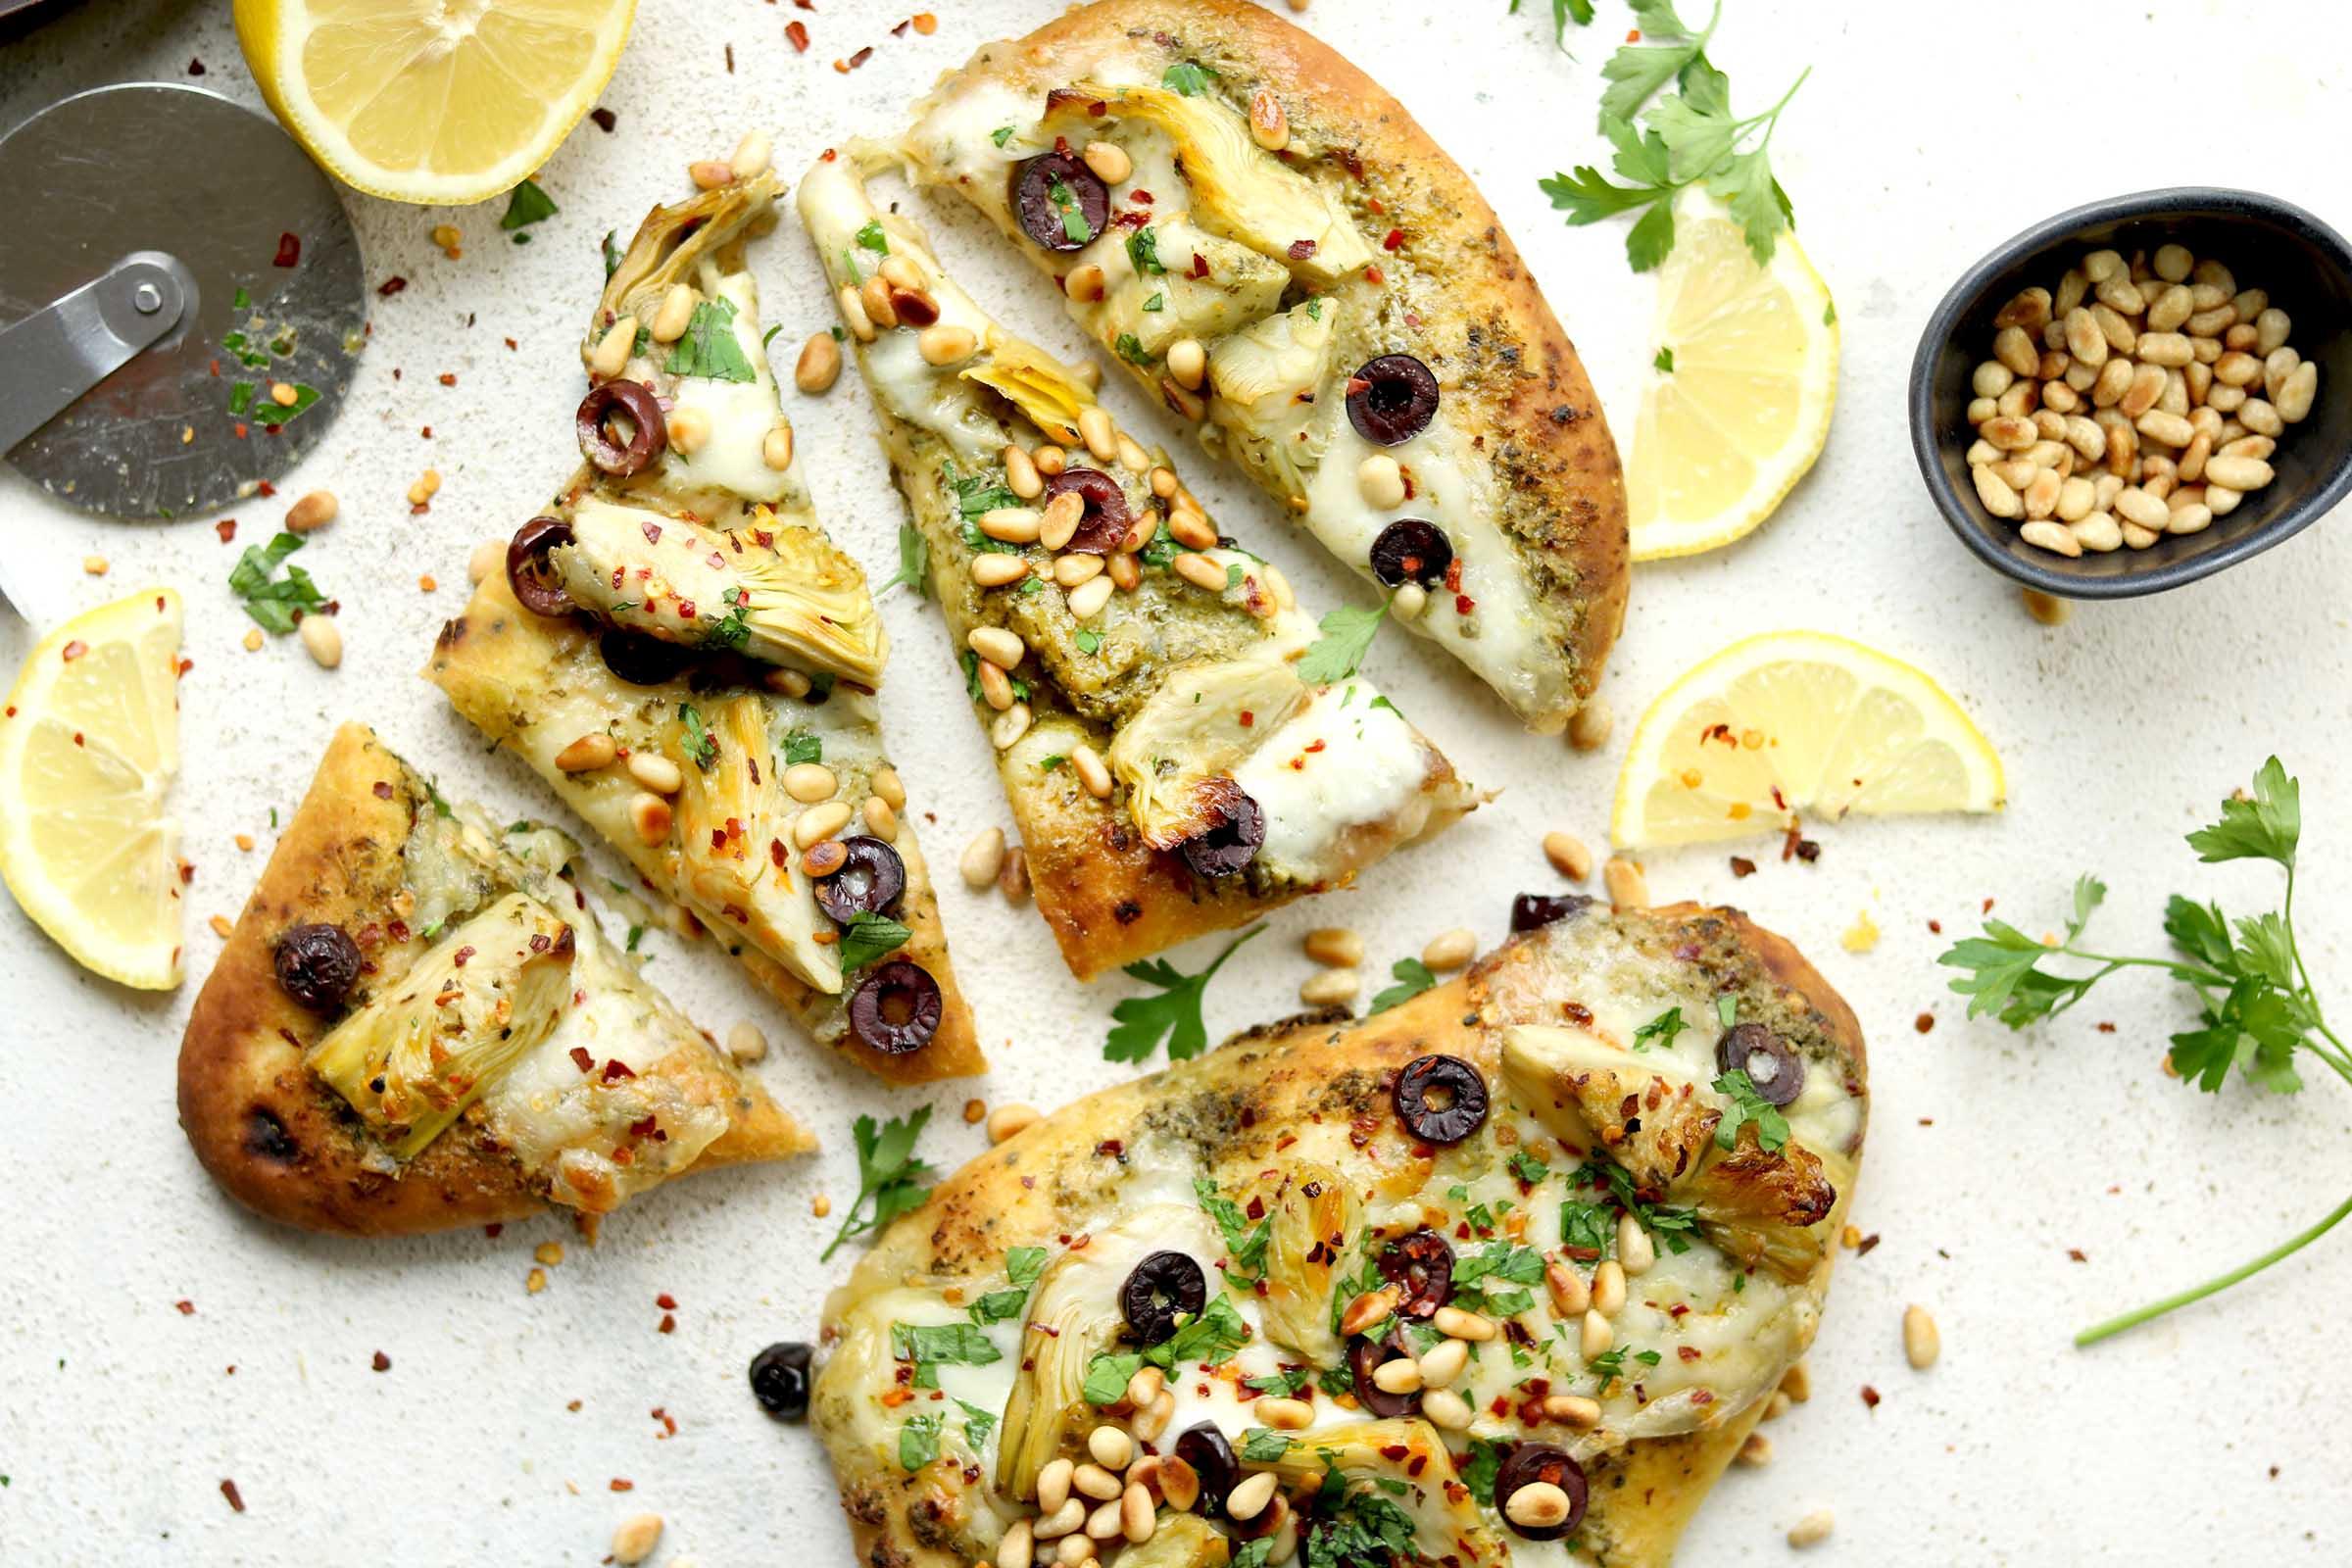 Artichoke & Olive Naan Pizza cut into slices landscape